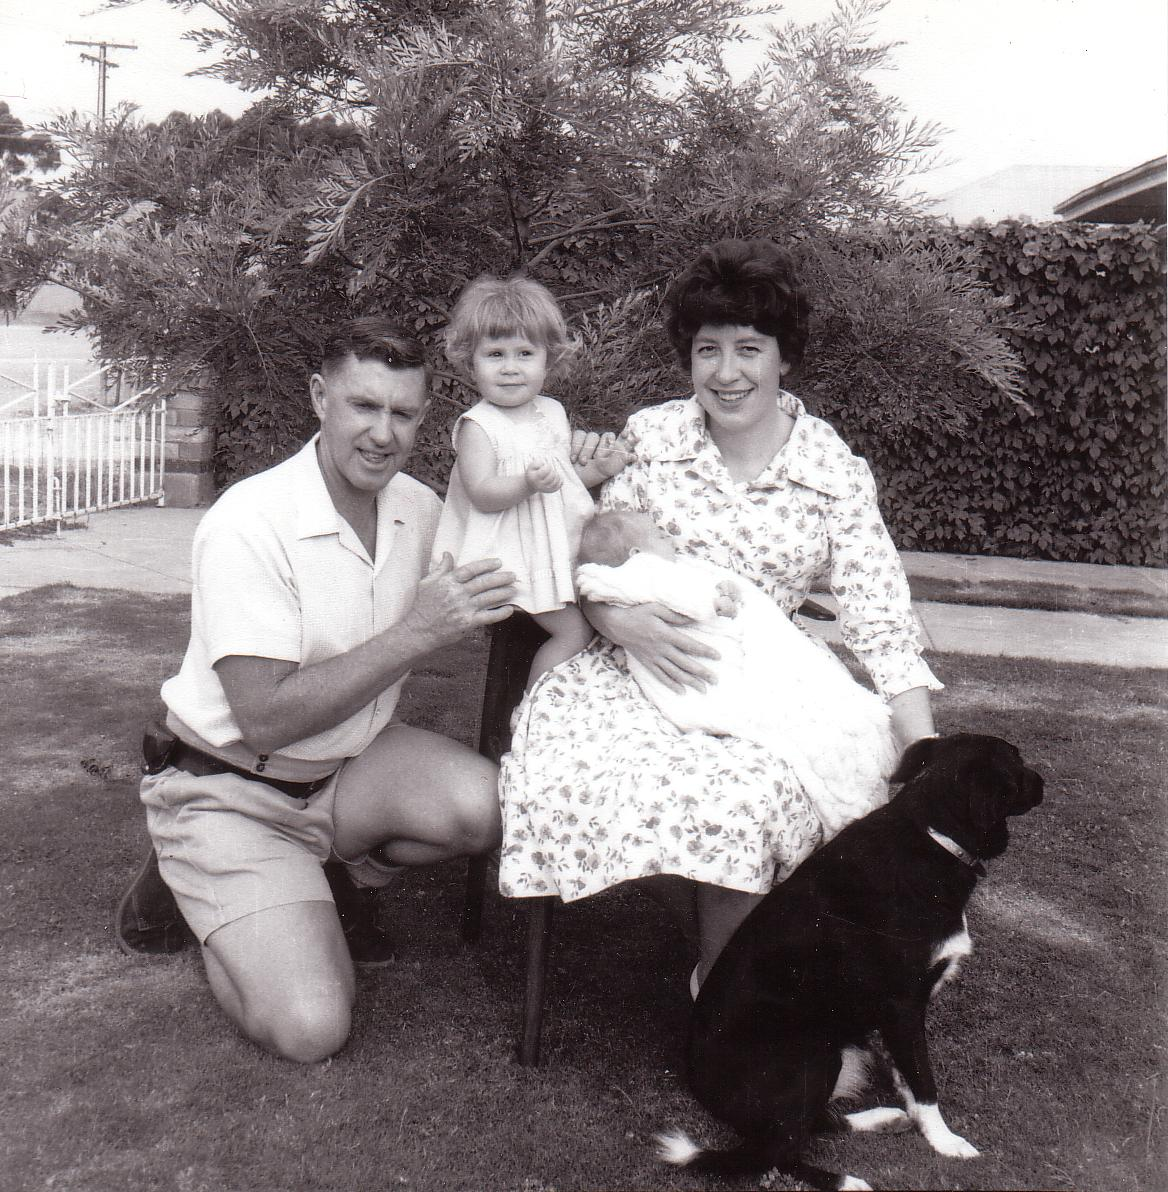 Beadell Family portrait 1963: Len, Connie, Gary, Anne, Bonnie the dog